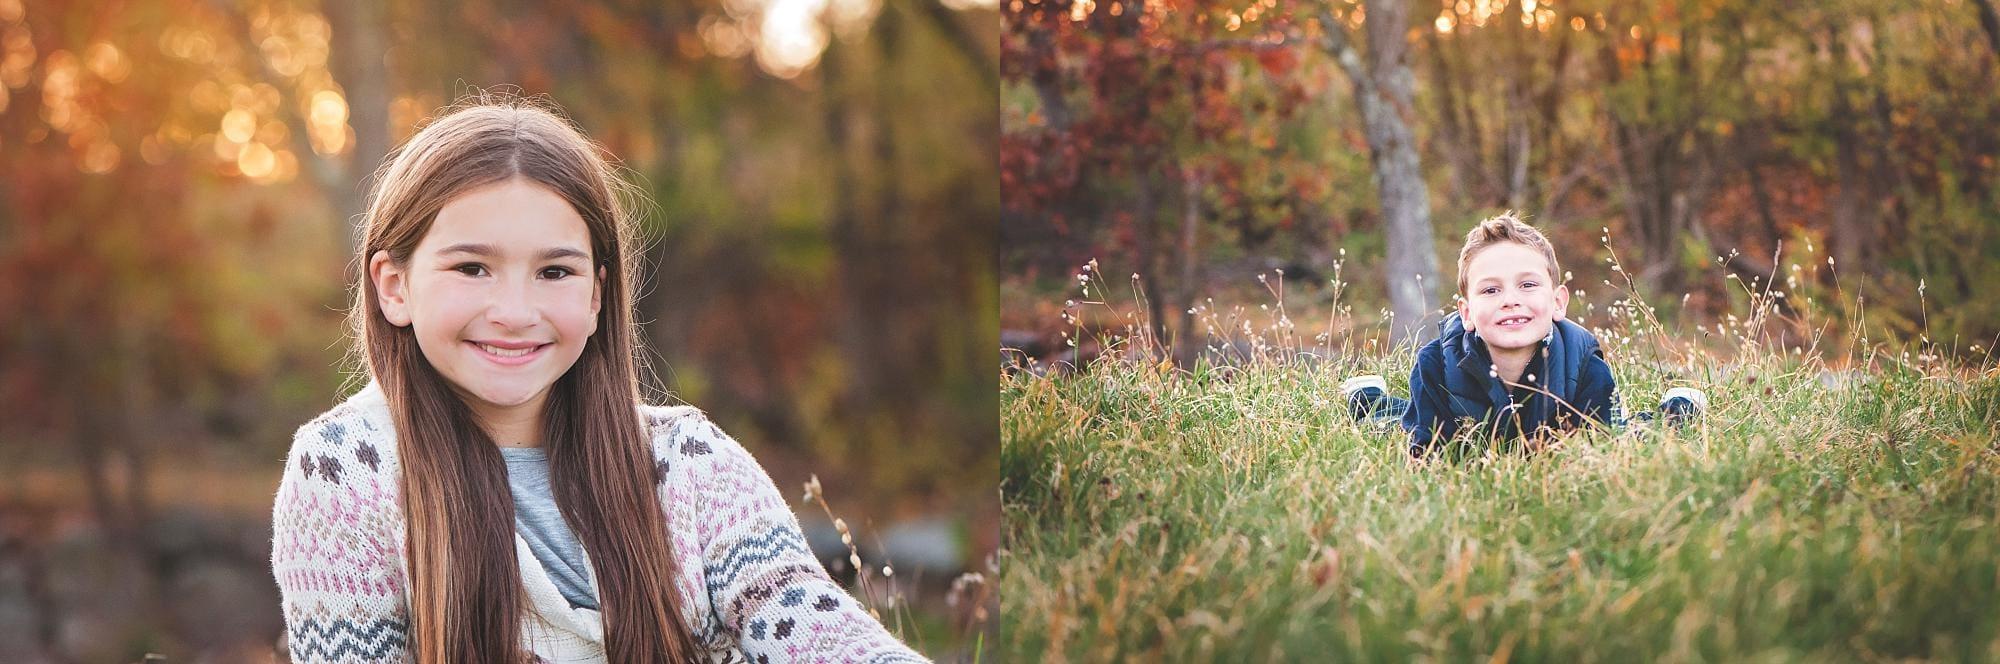 tween-boy-girl-closeup